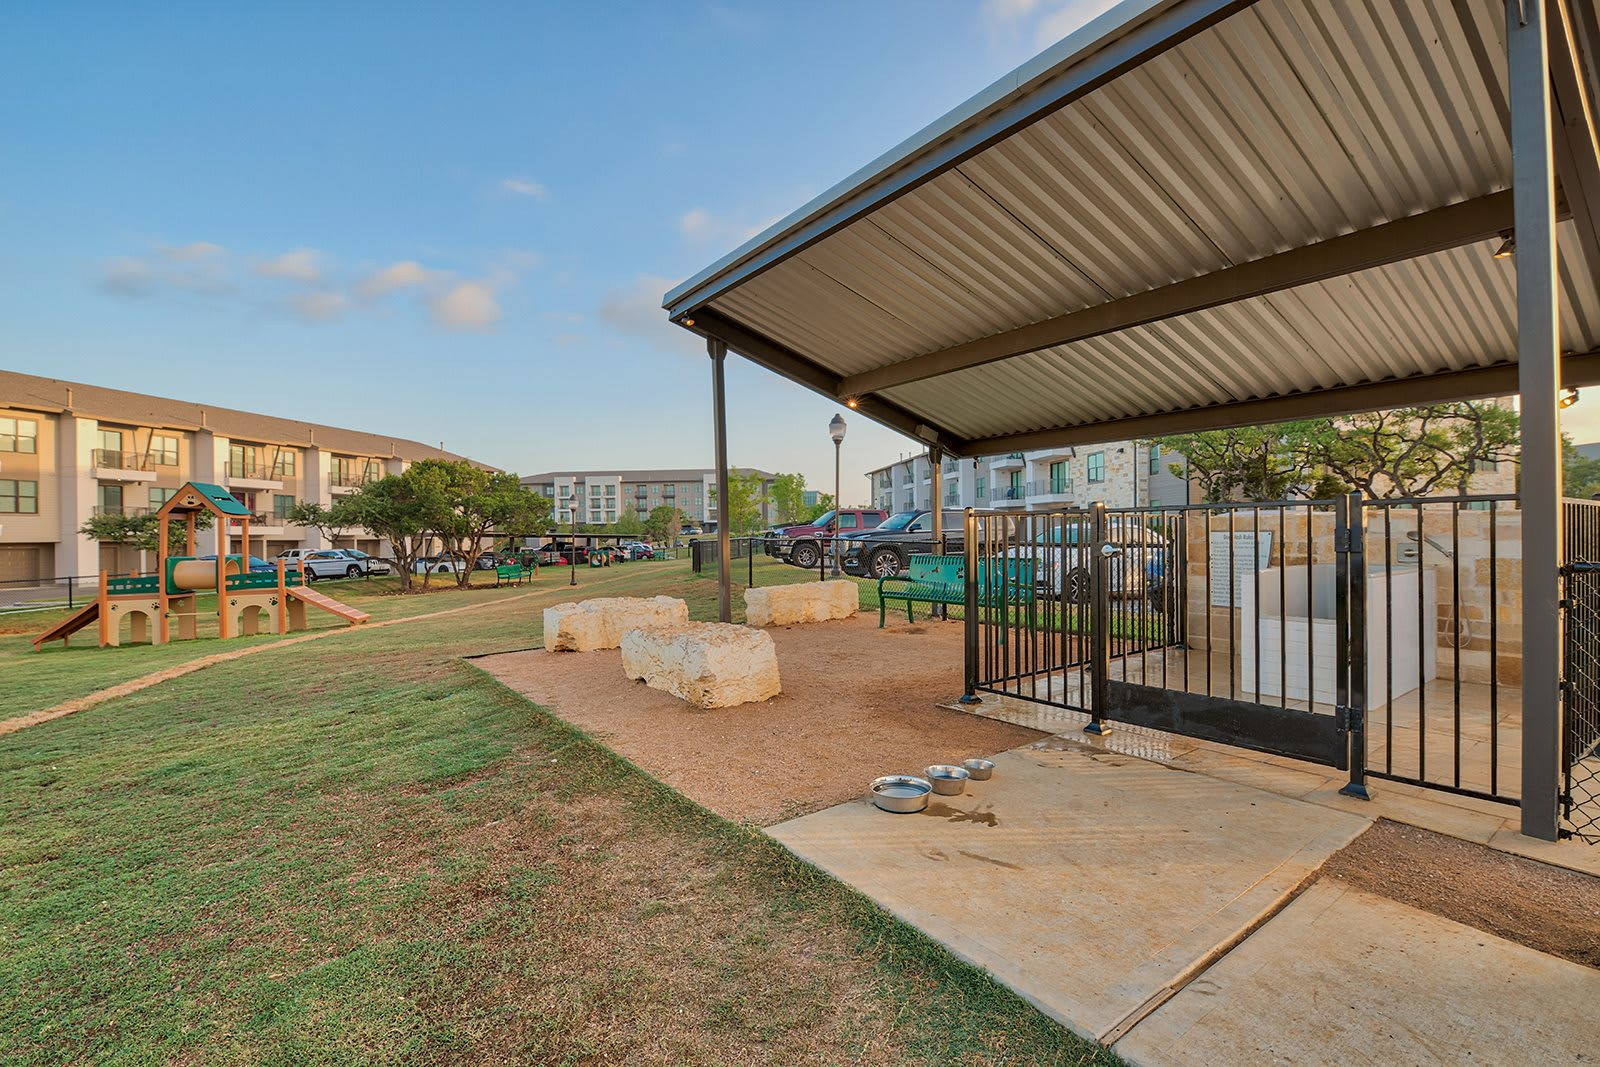 10,000 Square Foot Off-Leash Dog Park and Washing Station at Windsor Lantana Hills, Texas